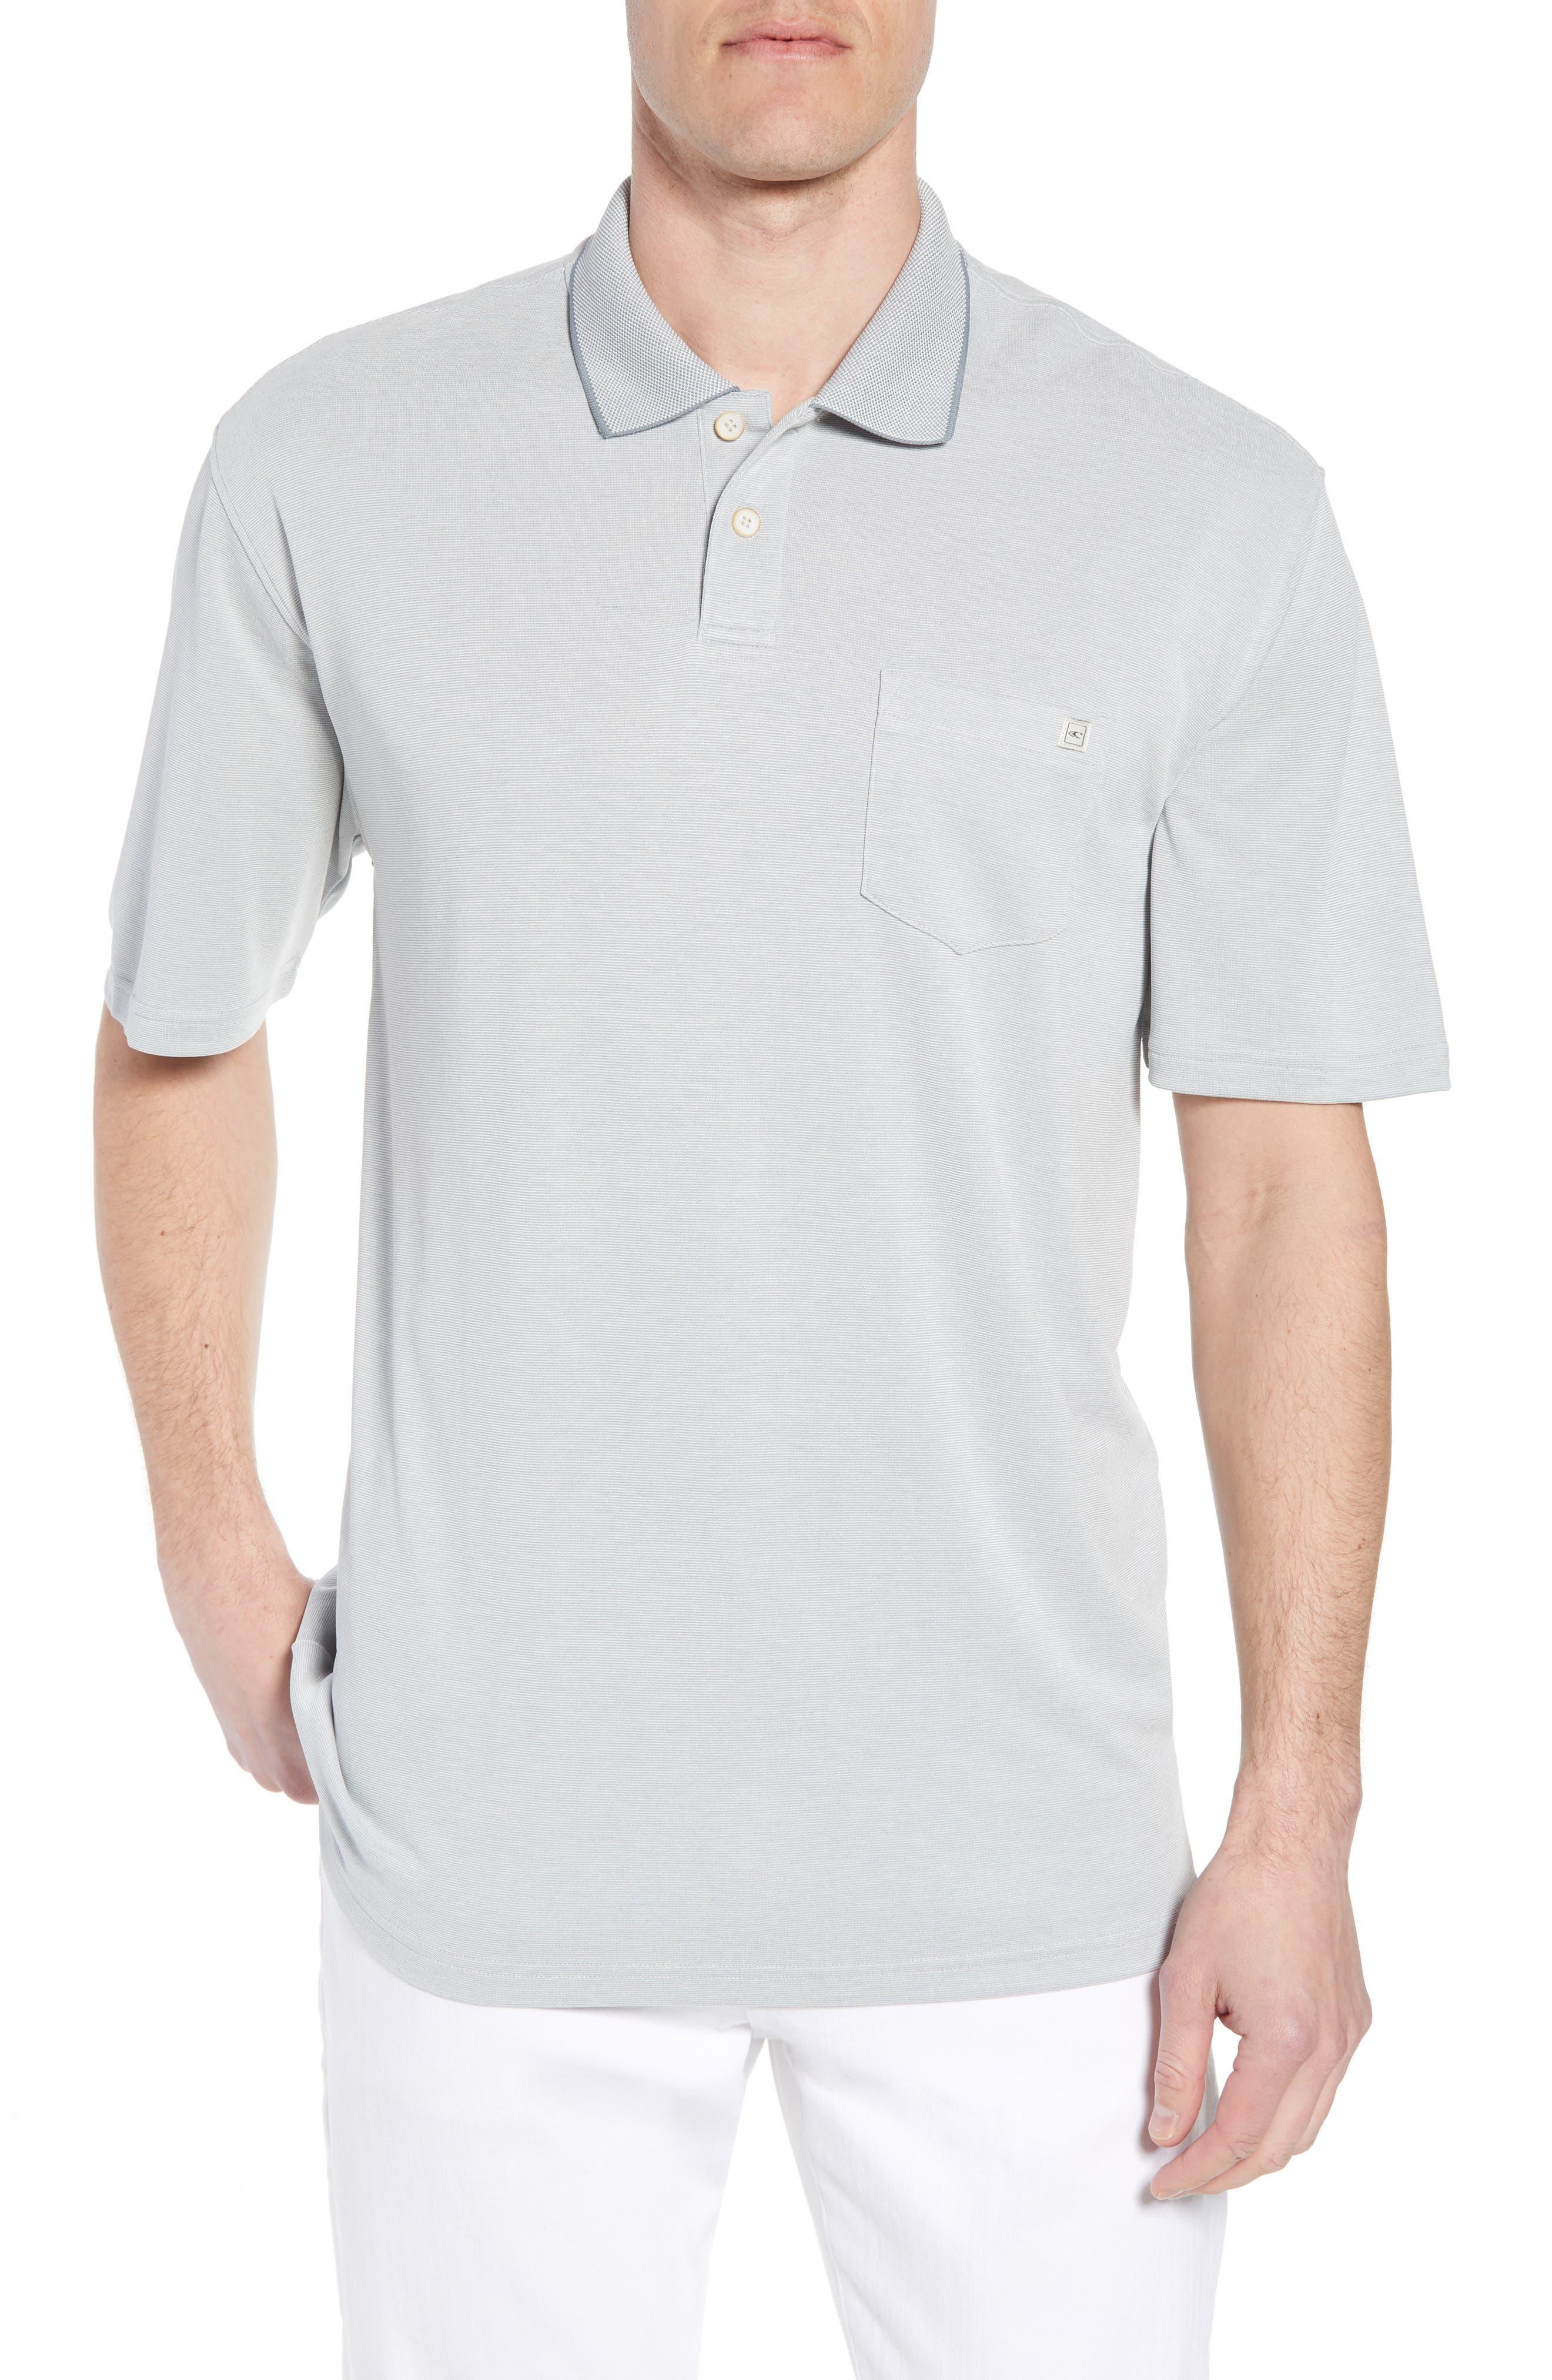 Gaviota Polo,                             Main thumbnail 1, color,                             Light Grey